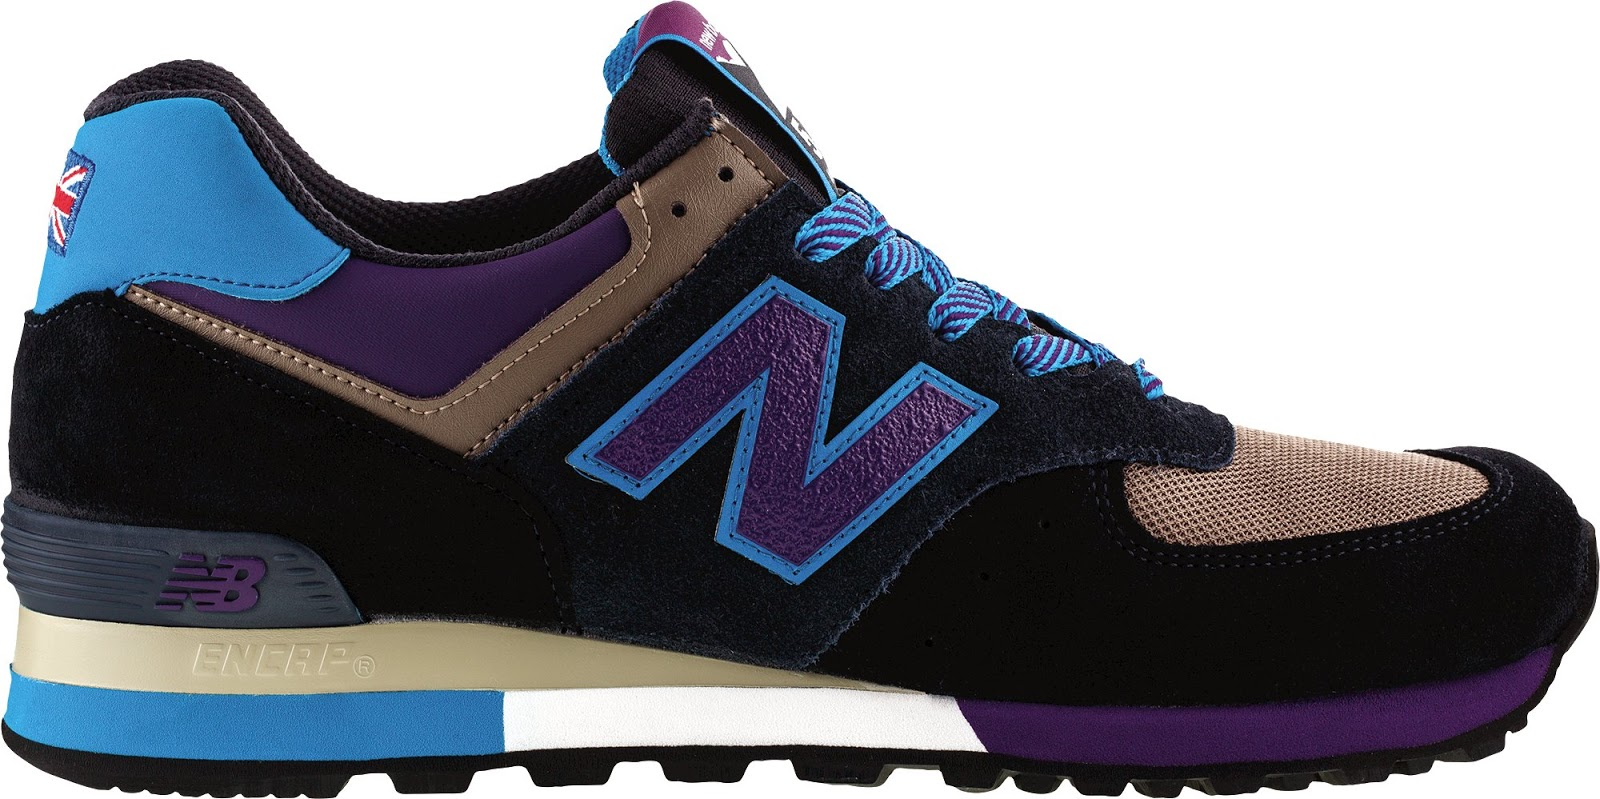 new balance 574 colorways